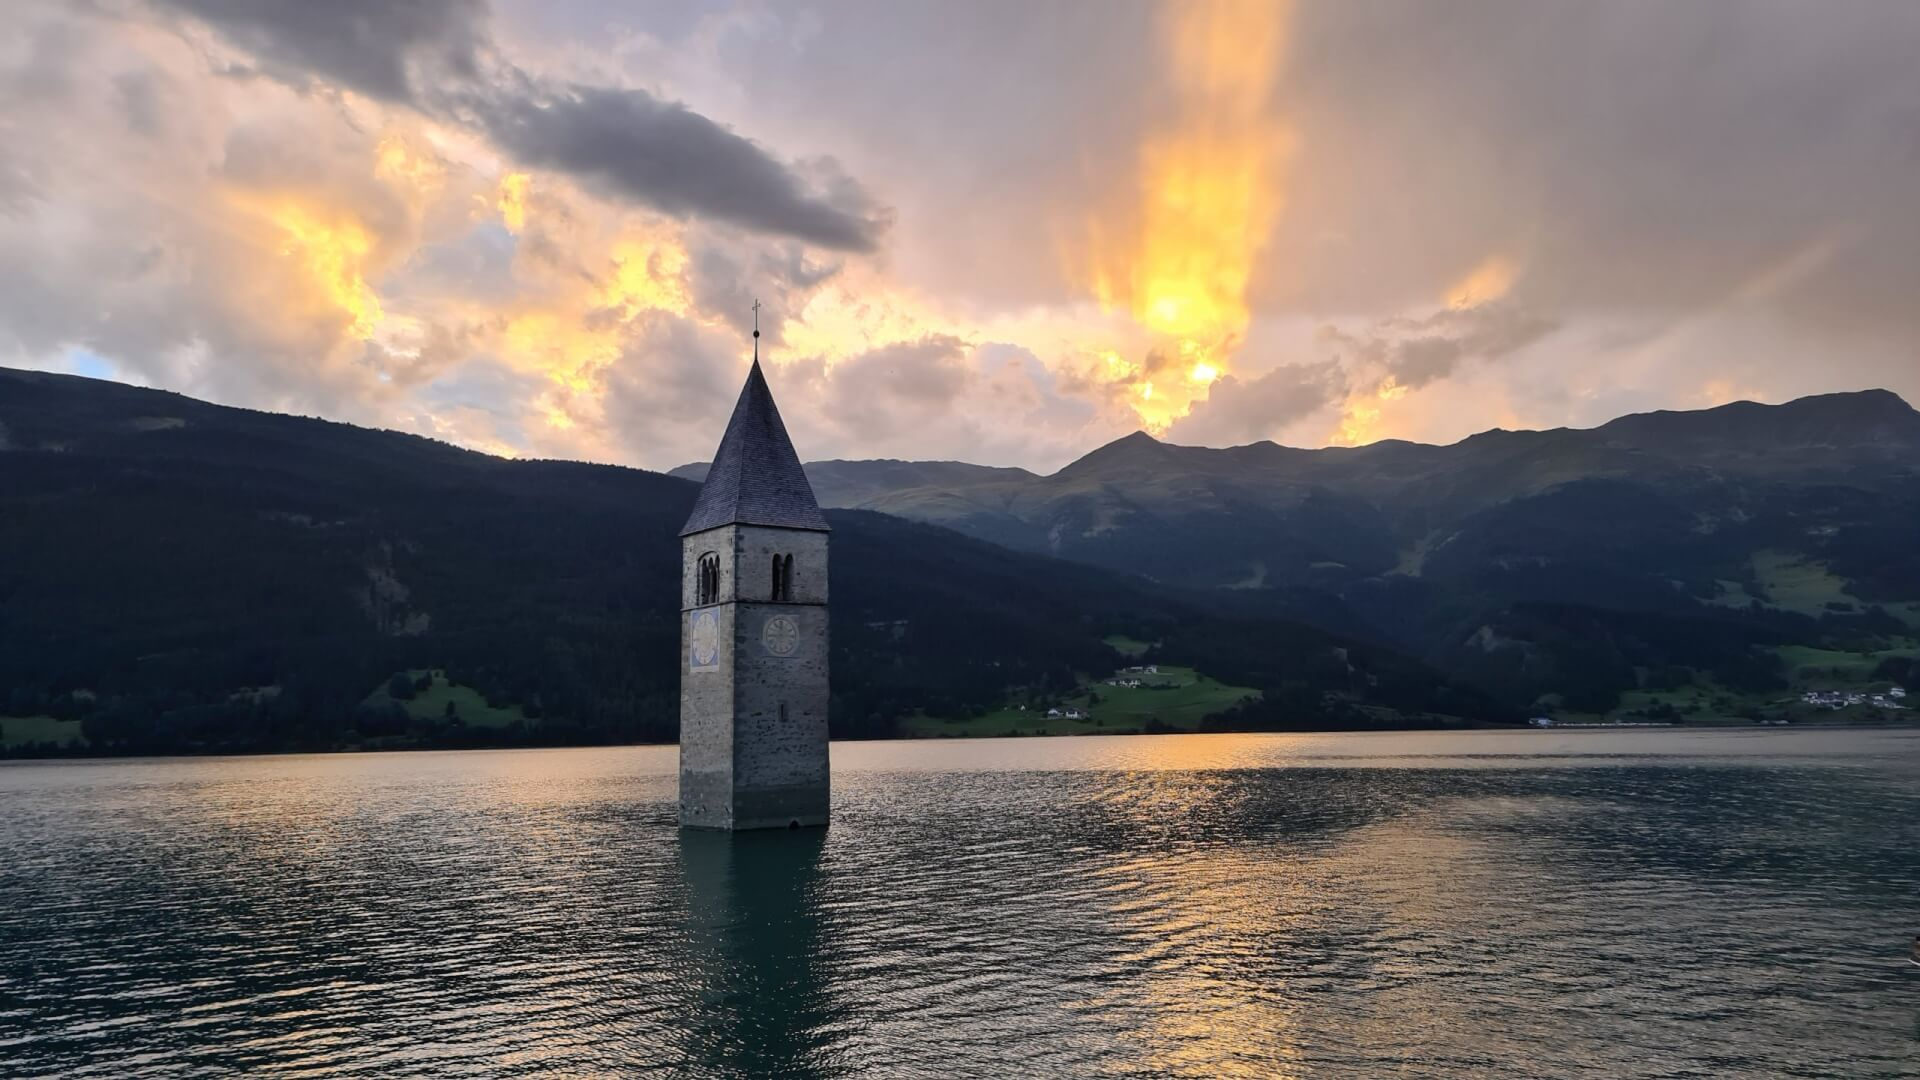 Versunkener Kirchturm Reschensee